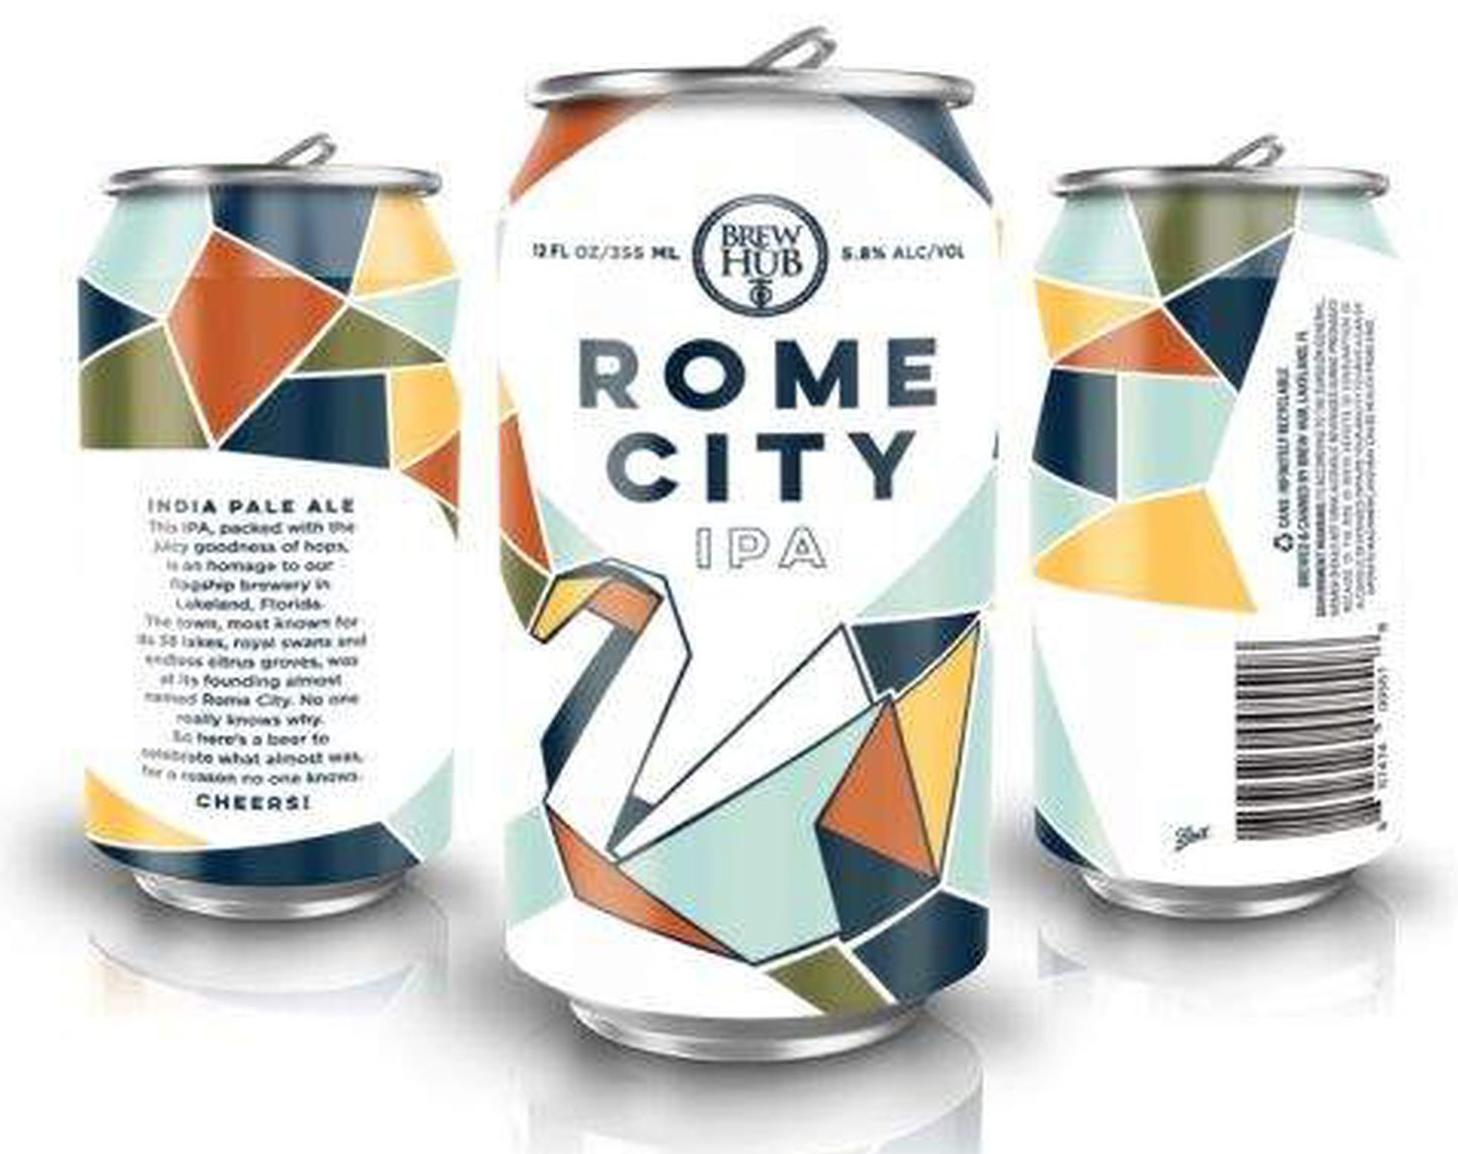 Brew Hub Rome City